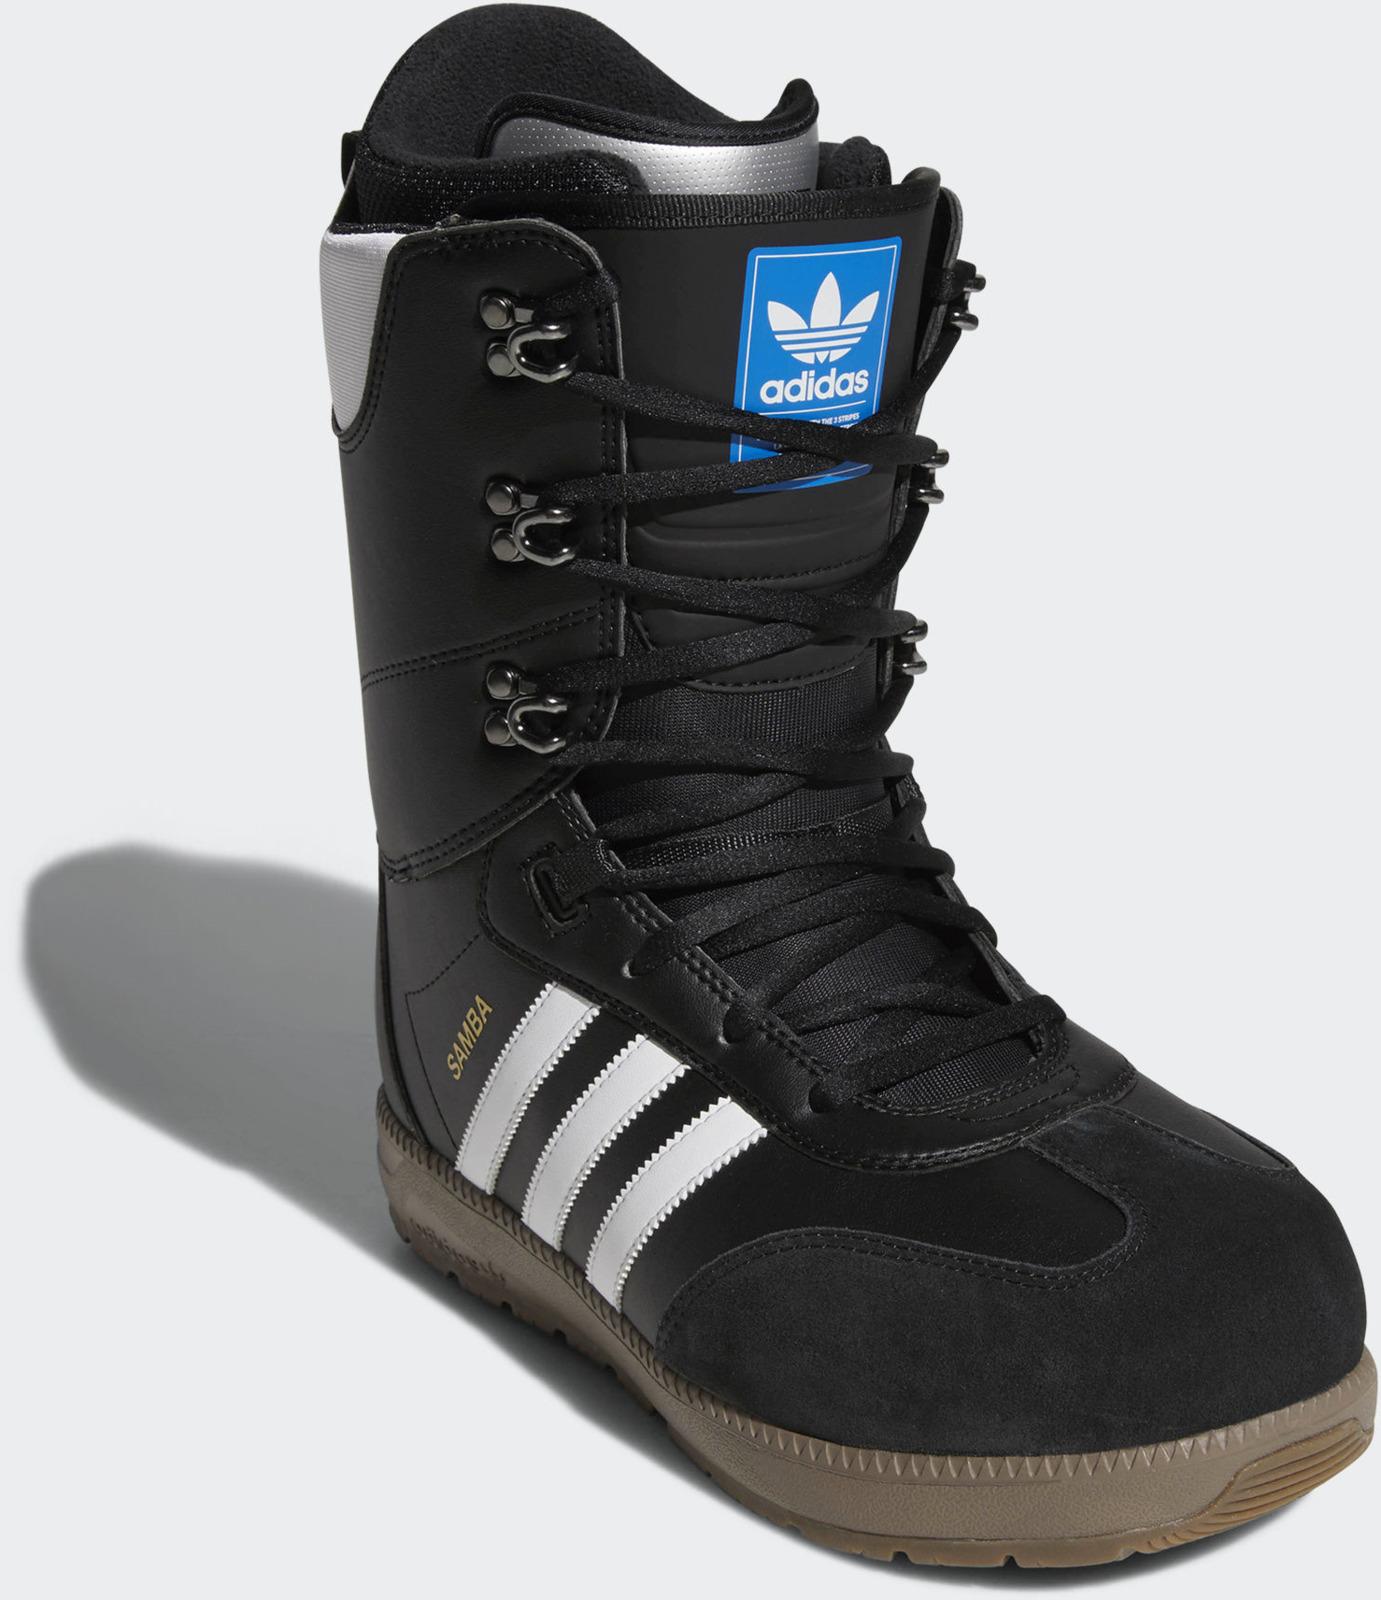 Ботинки для сноуборда adidas